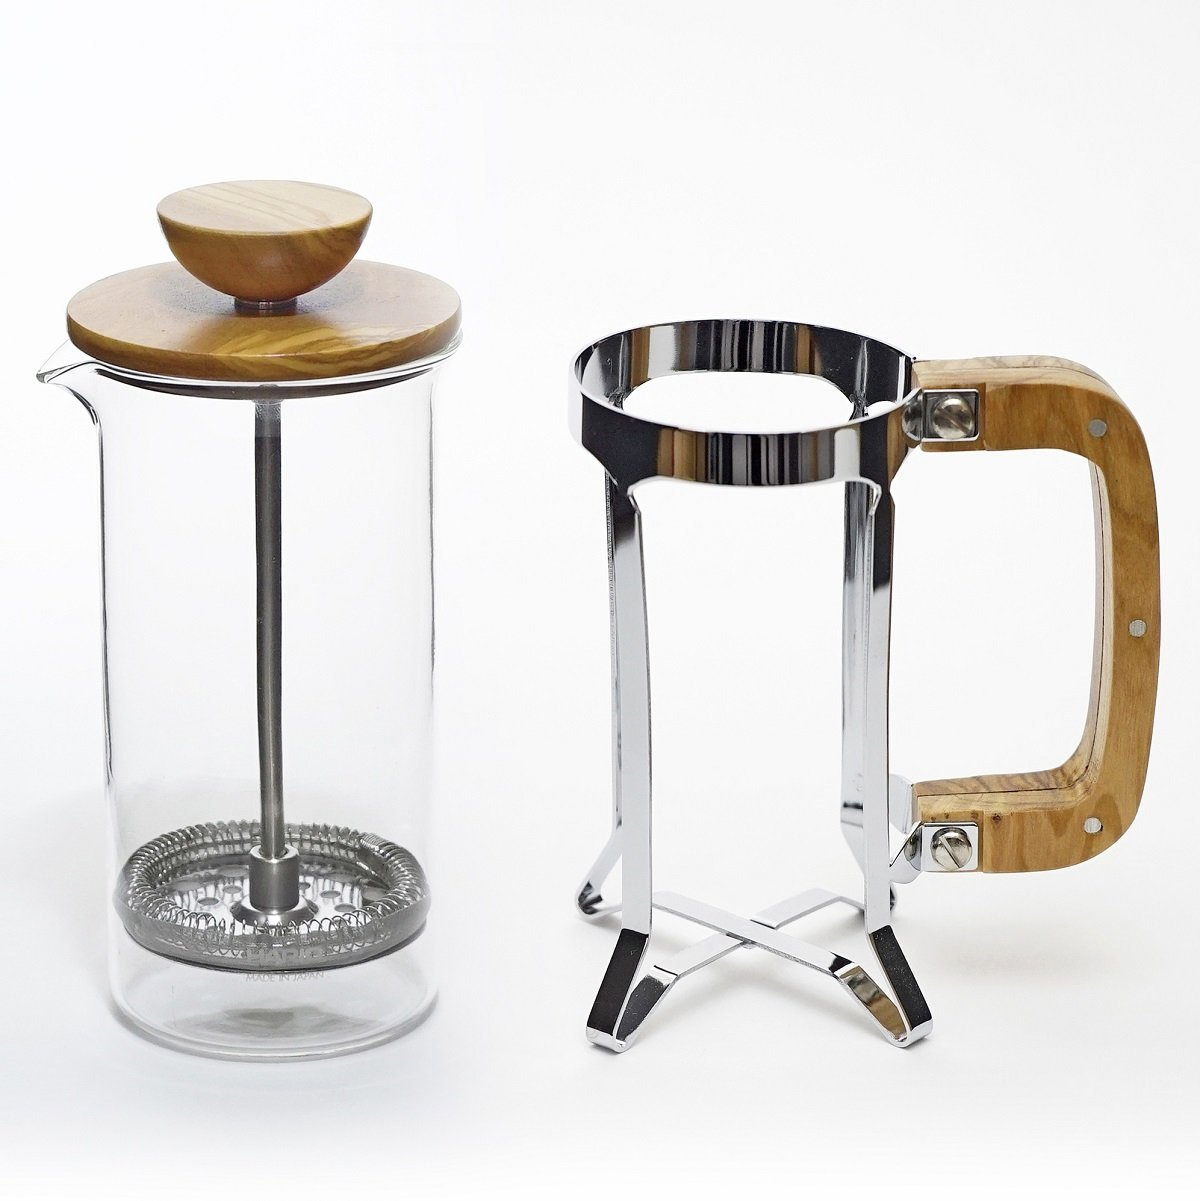 Hario CPSW-2-OV Olivewood Cafépress Coffee and Tea Press, 300ml by Hario (Image #5)